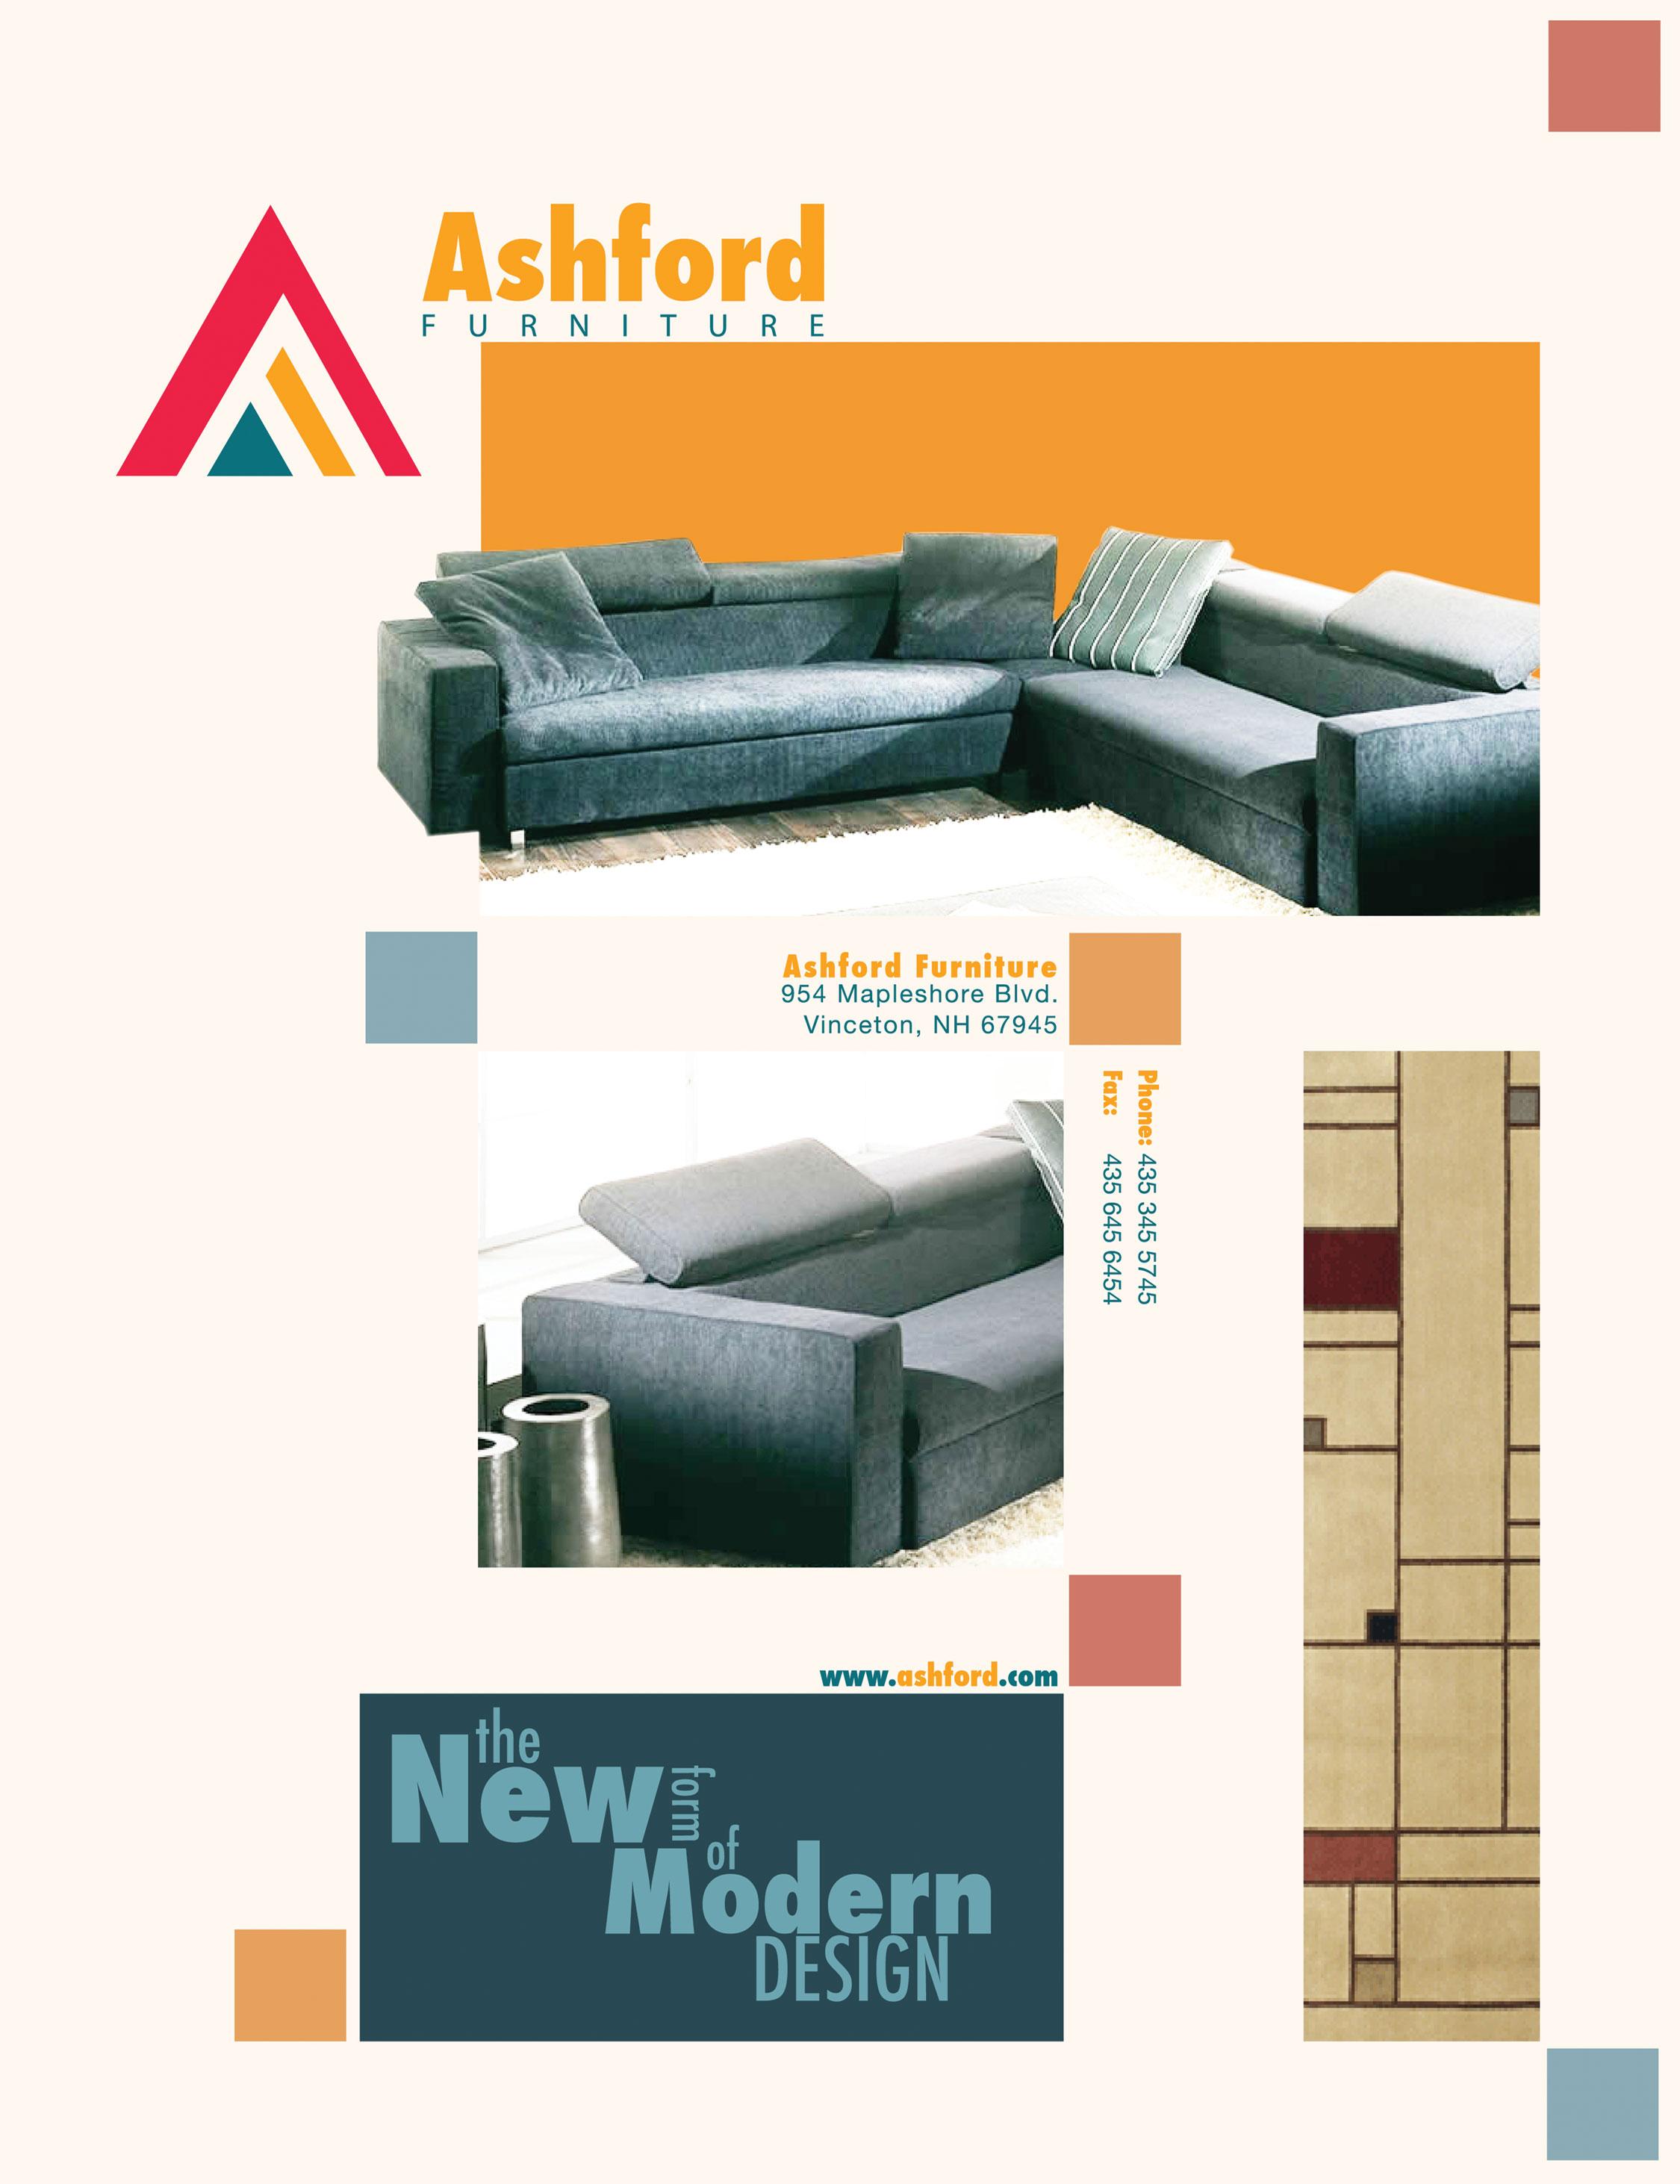 Ashford Furniture by Michael Date at Coroflot.com